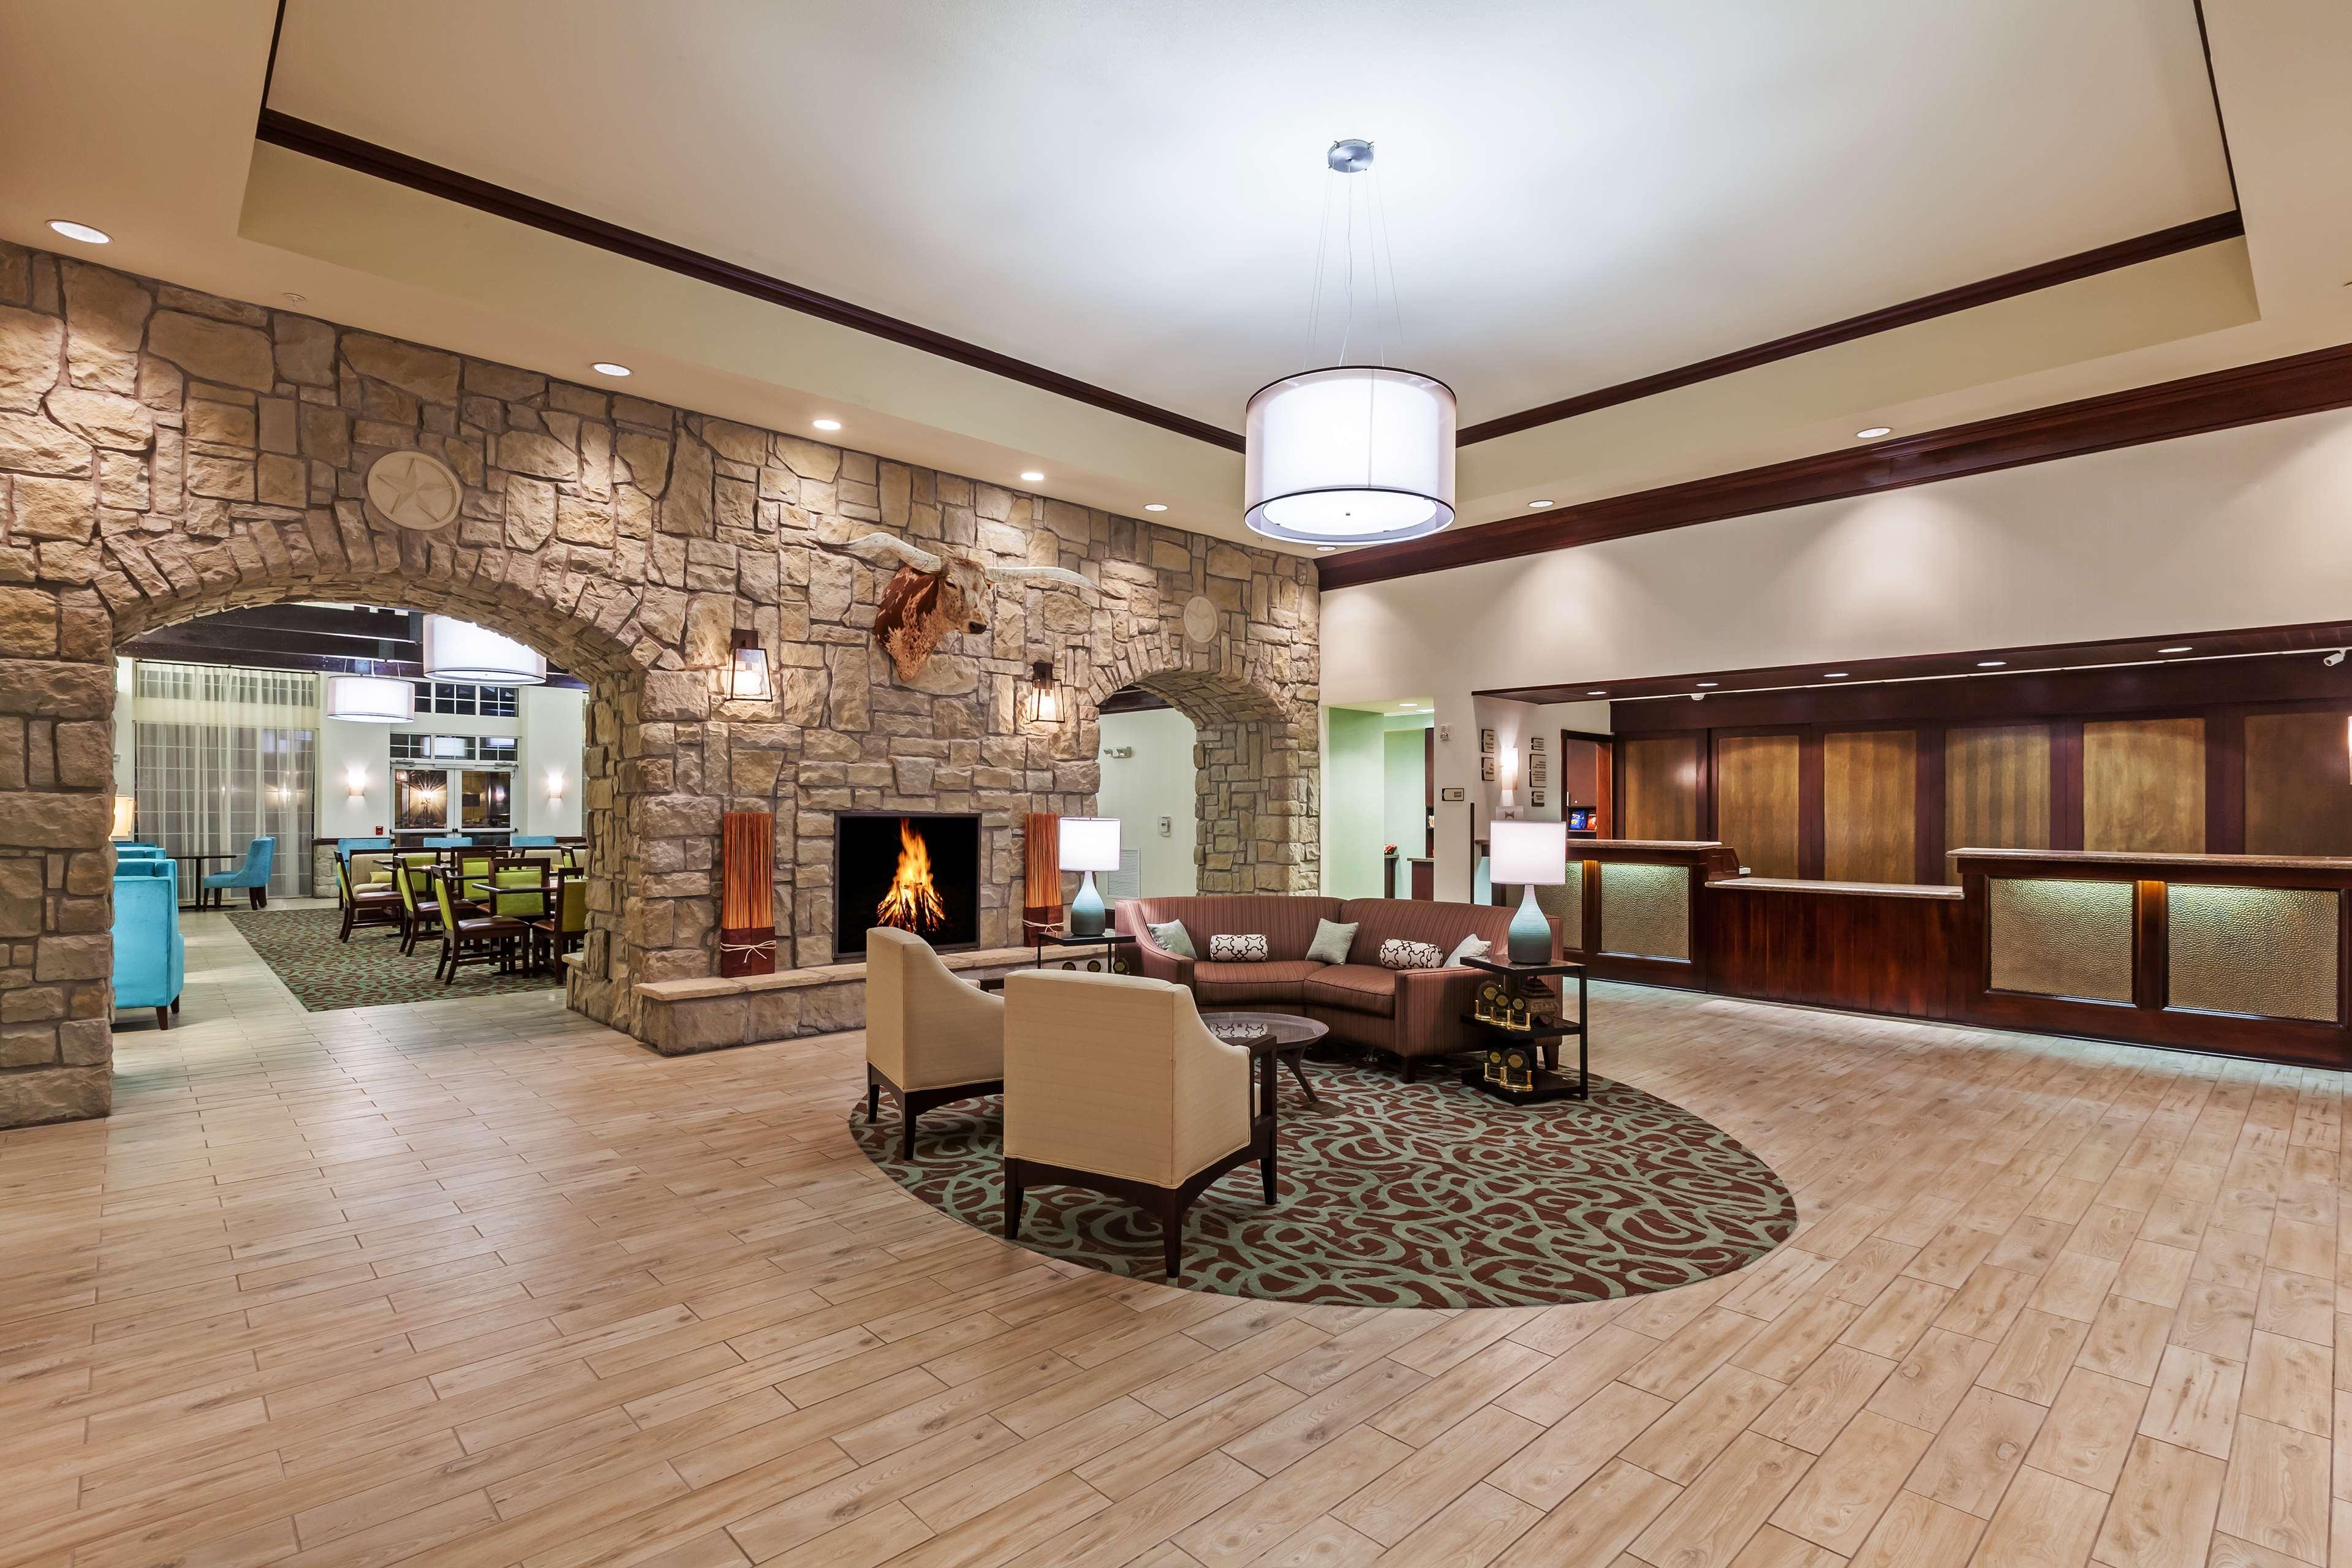 Homewood Suites by Hilton Wichita Falls image 6